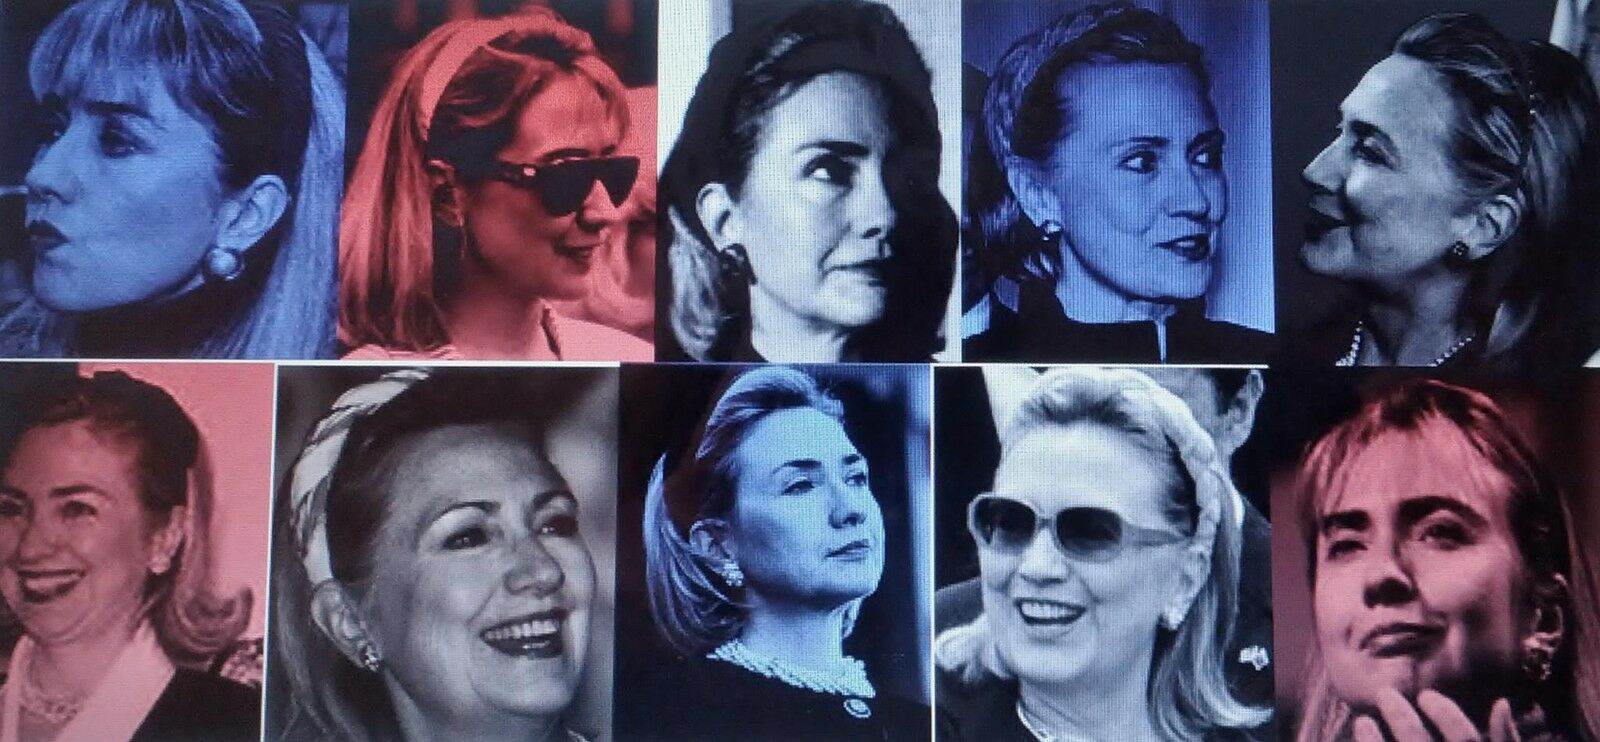 Hillary 2016 Headbands